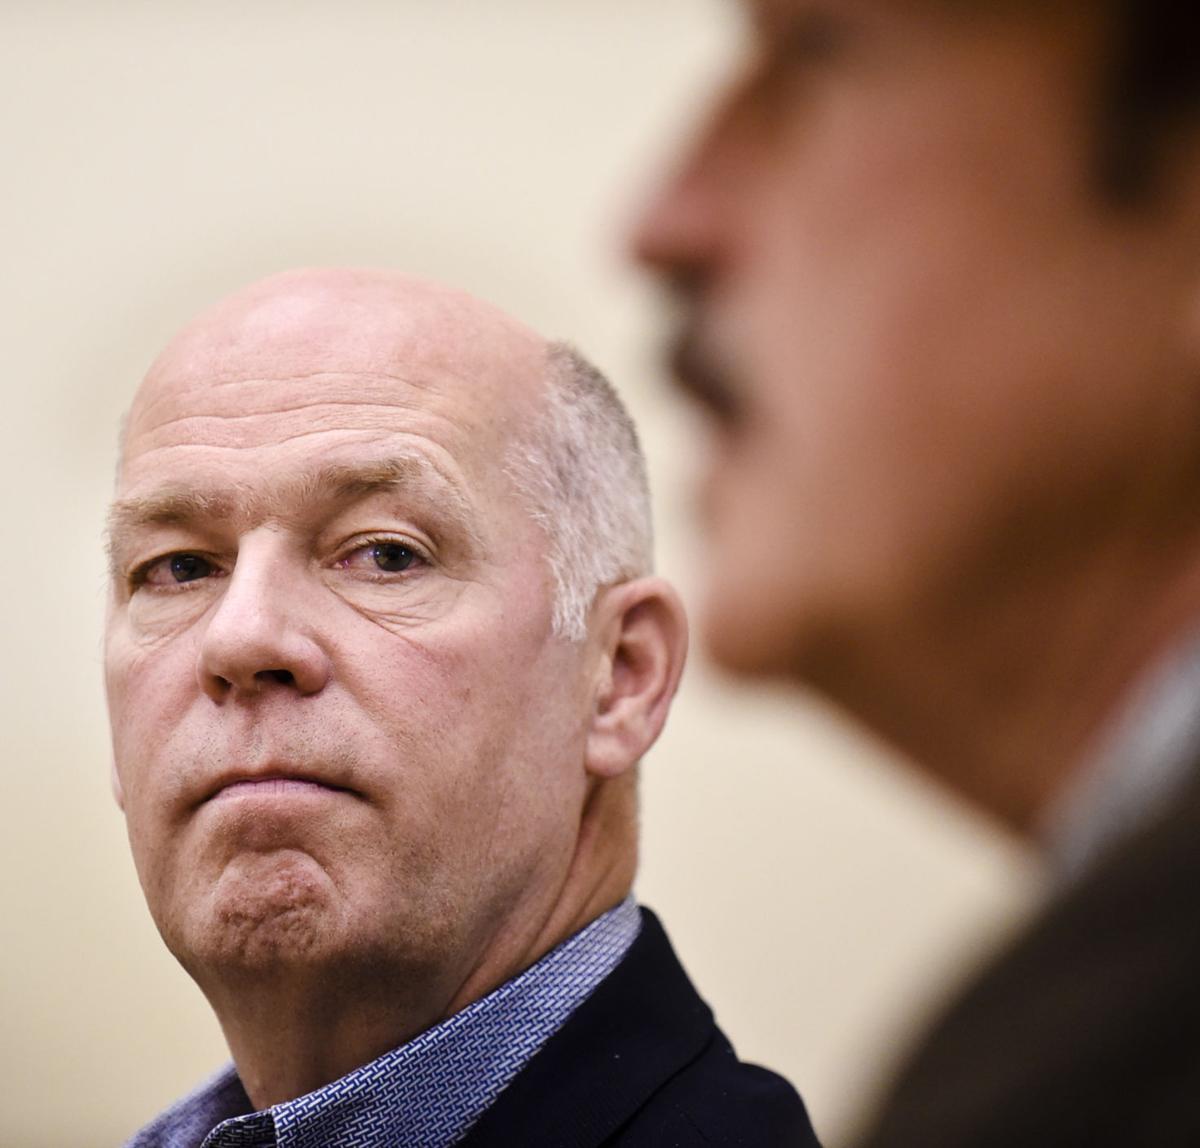 Montana congressional candidate Greg Gianforte